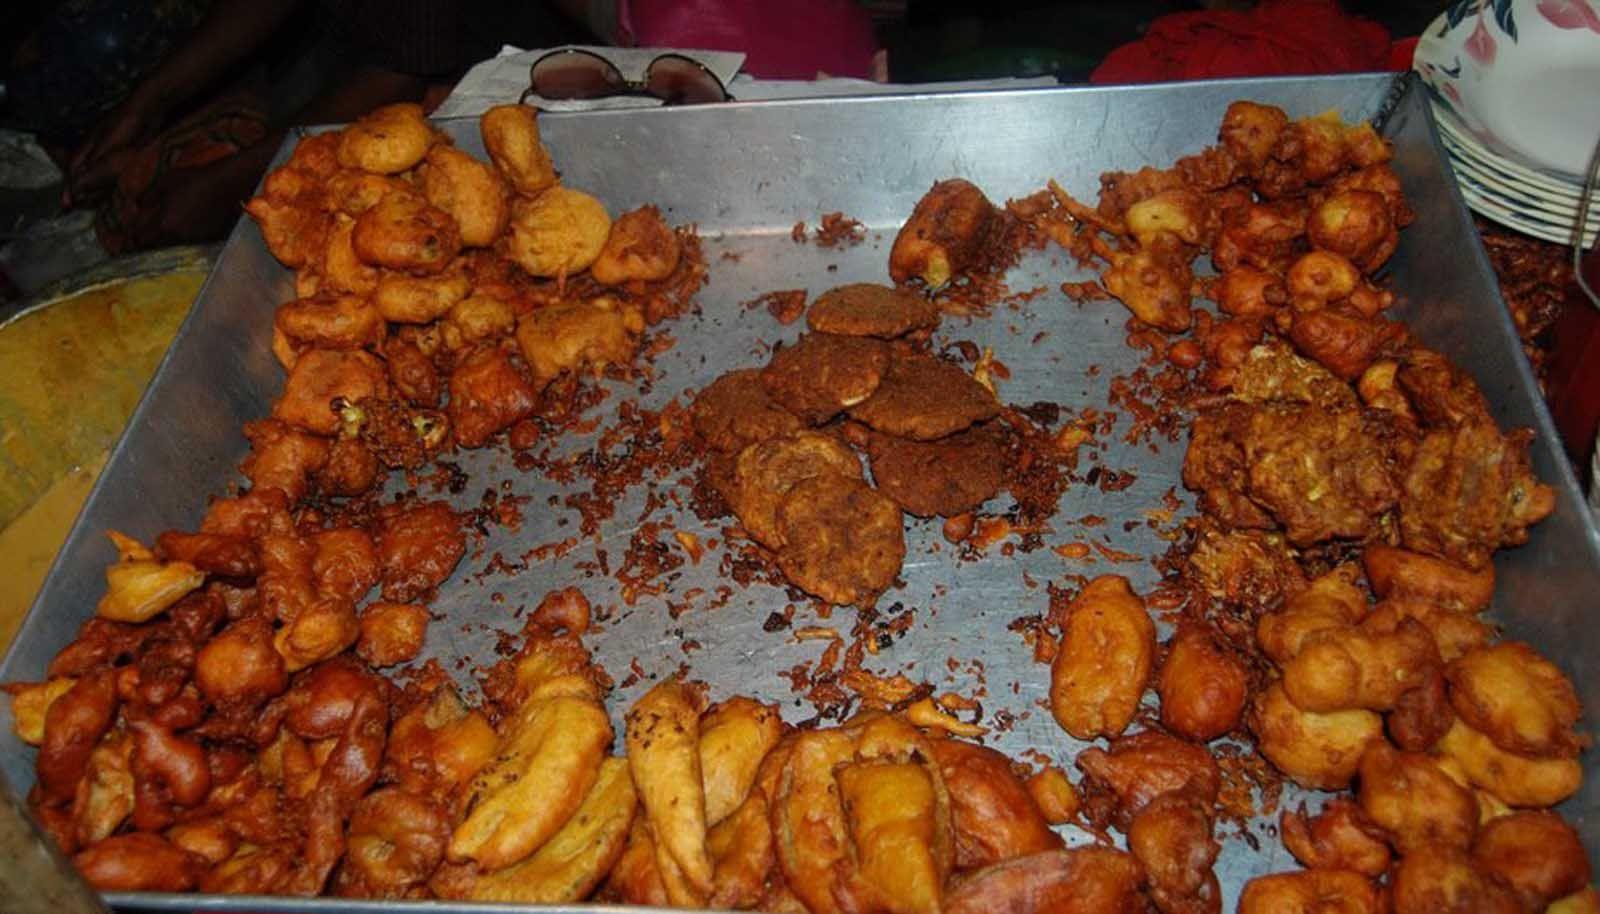 Bangali foods bangladeshi street foods most delicious food in bangali foods bangladeshi street foods forumfinder Gallery